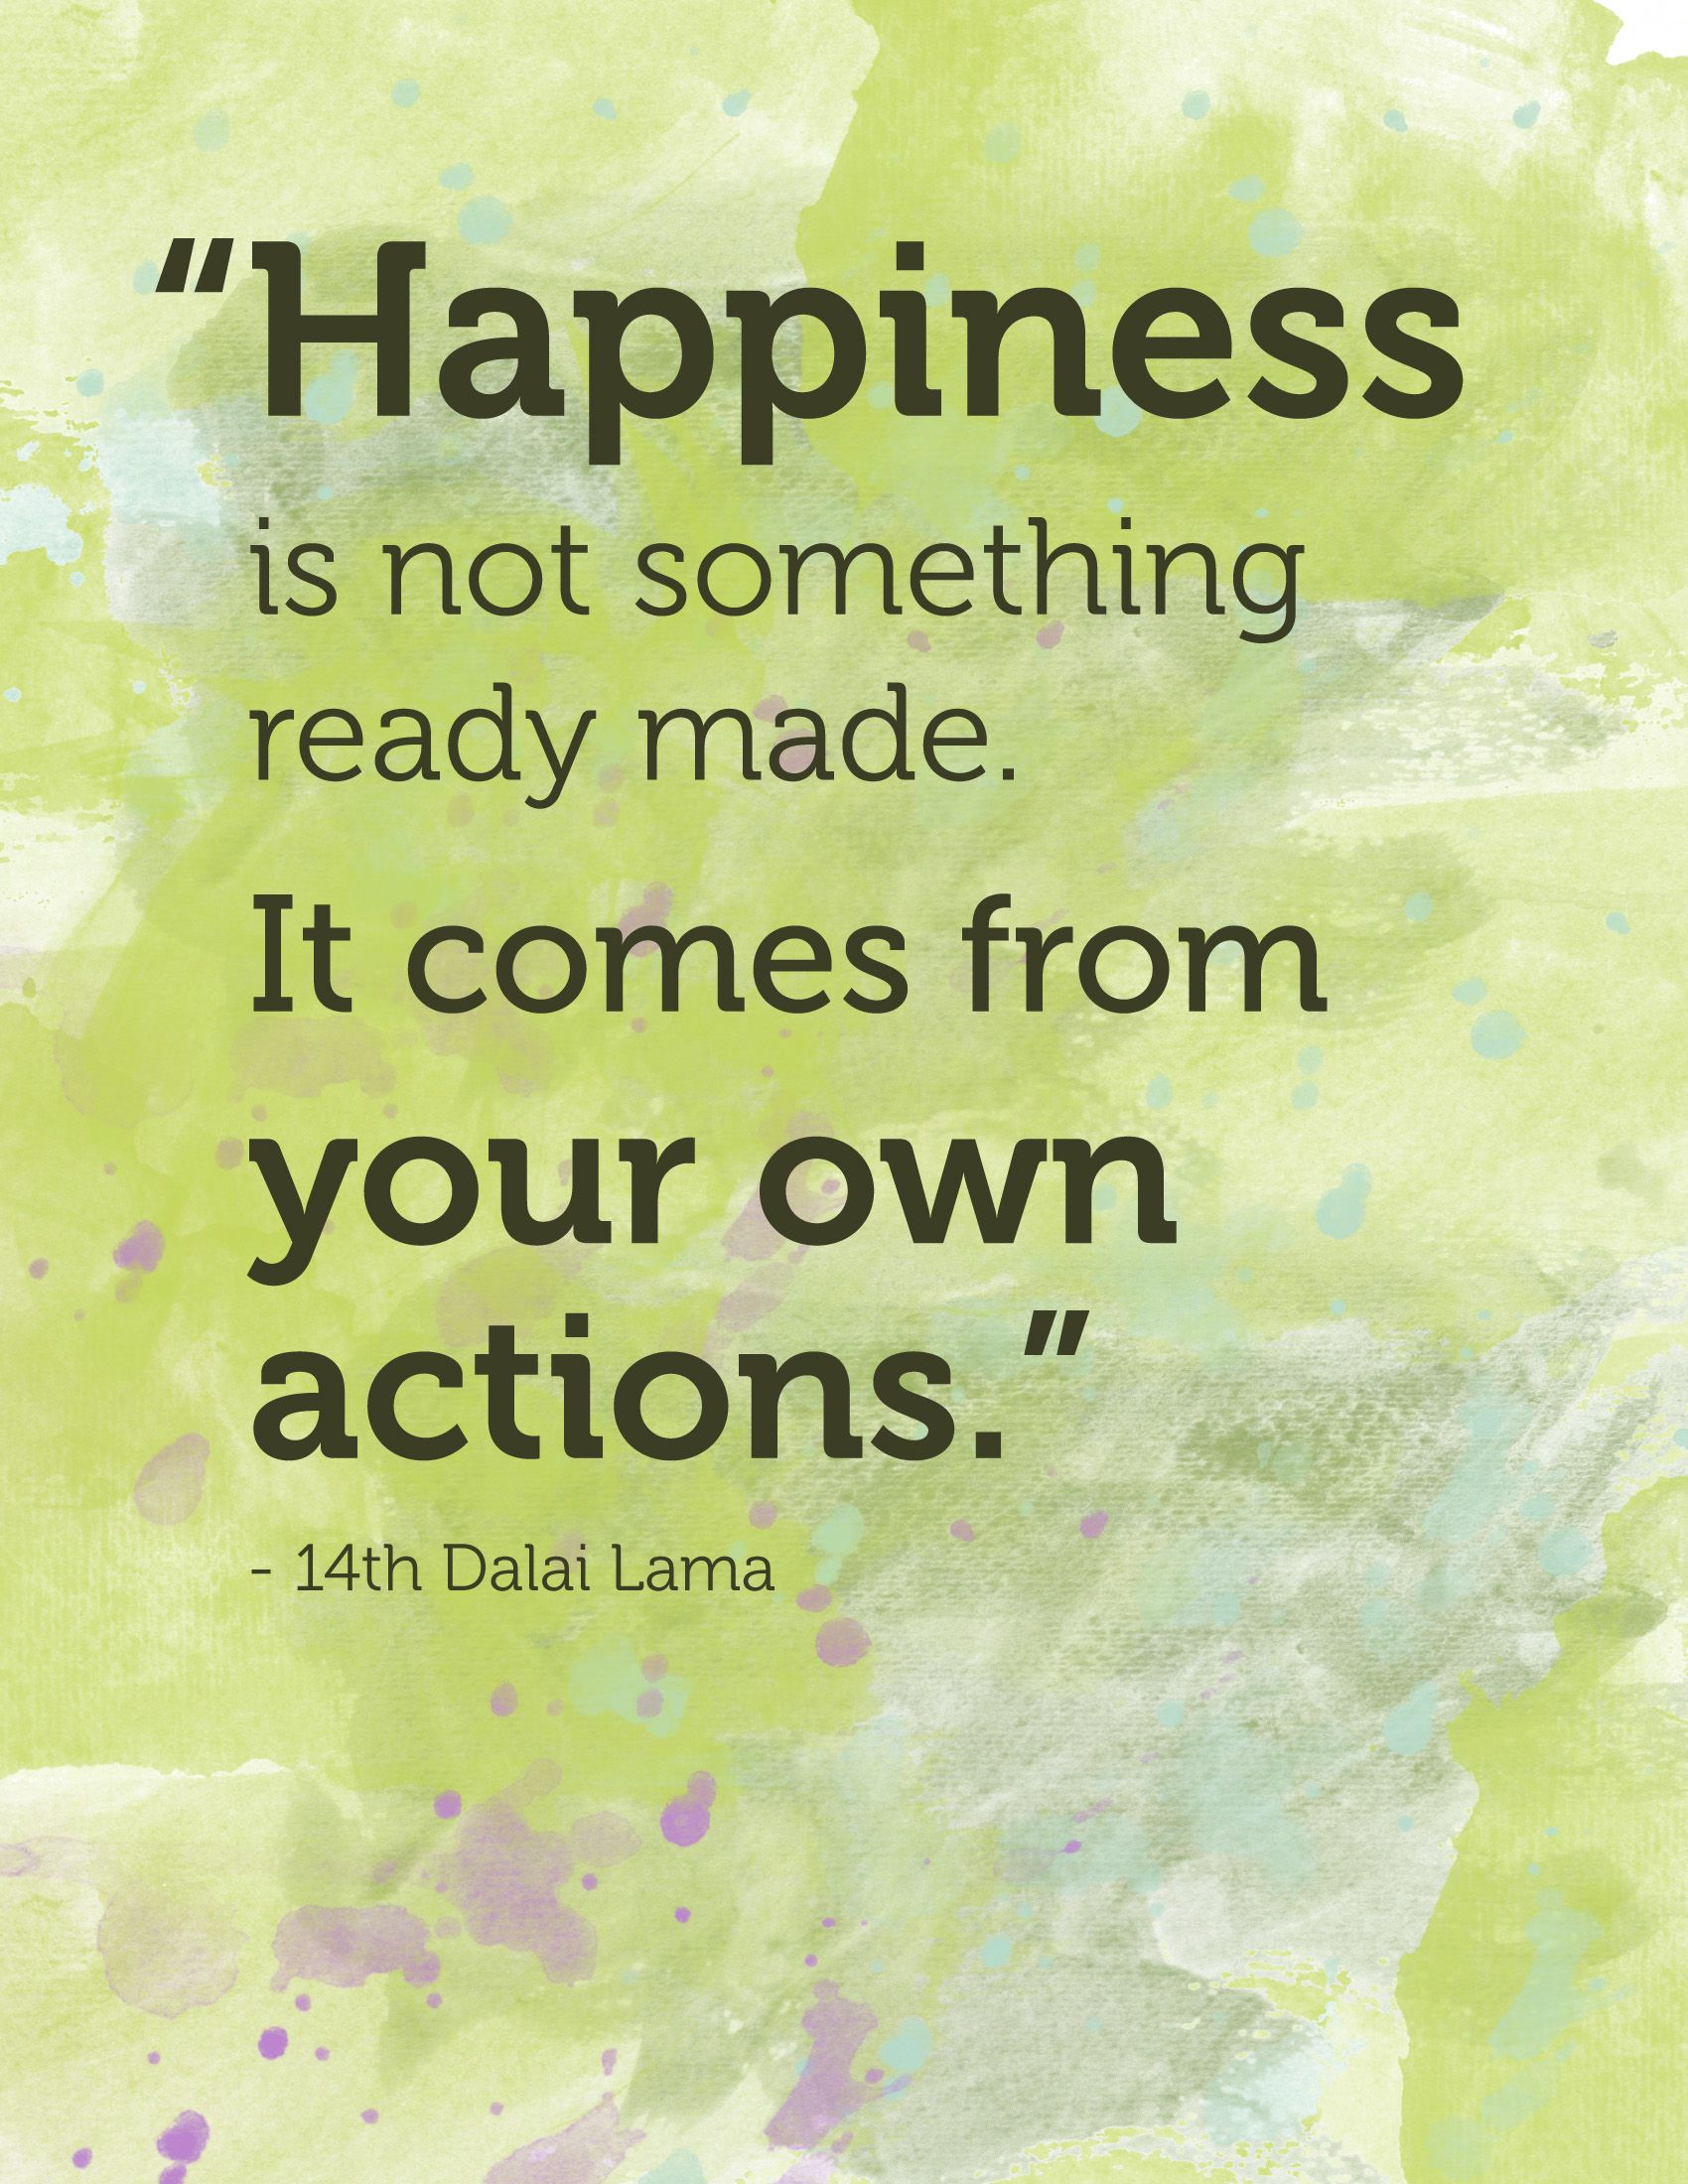 Dalai Lama Quote On Happiness